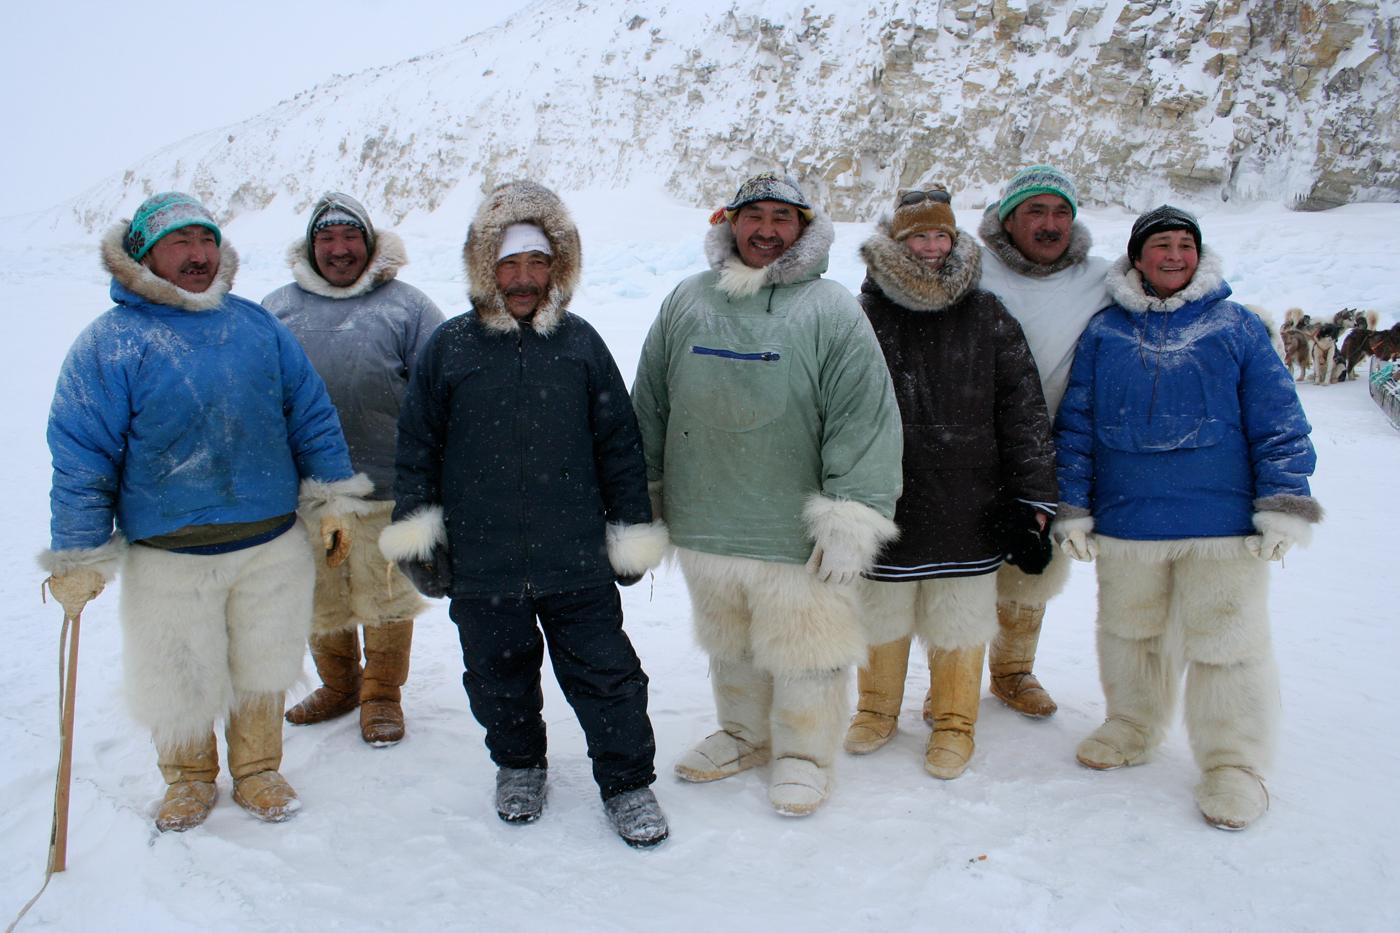 http://4.bp.blogspot.com/-H_MWqrbvHeE/TjJSNvo9j0I/AAAAAAAACYc/tP9Qh9ujFRg/s1600/eskimo2.jpg